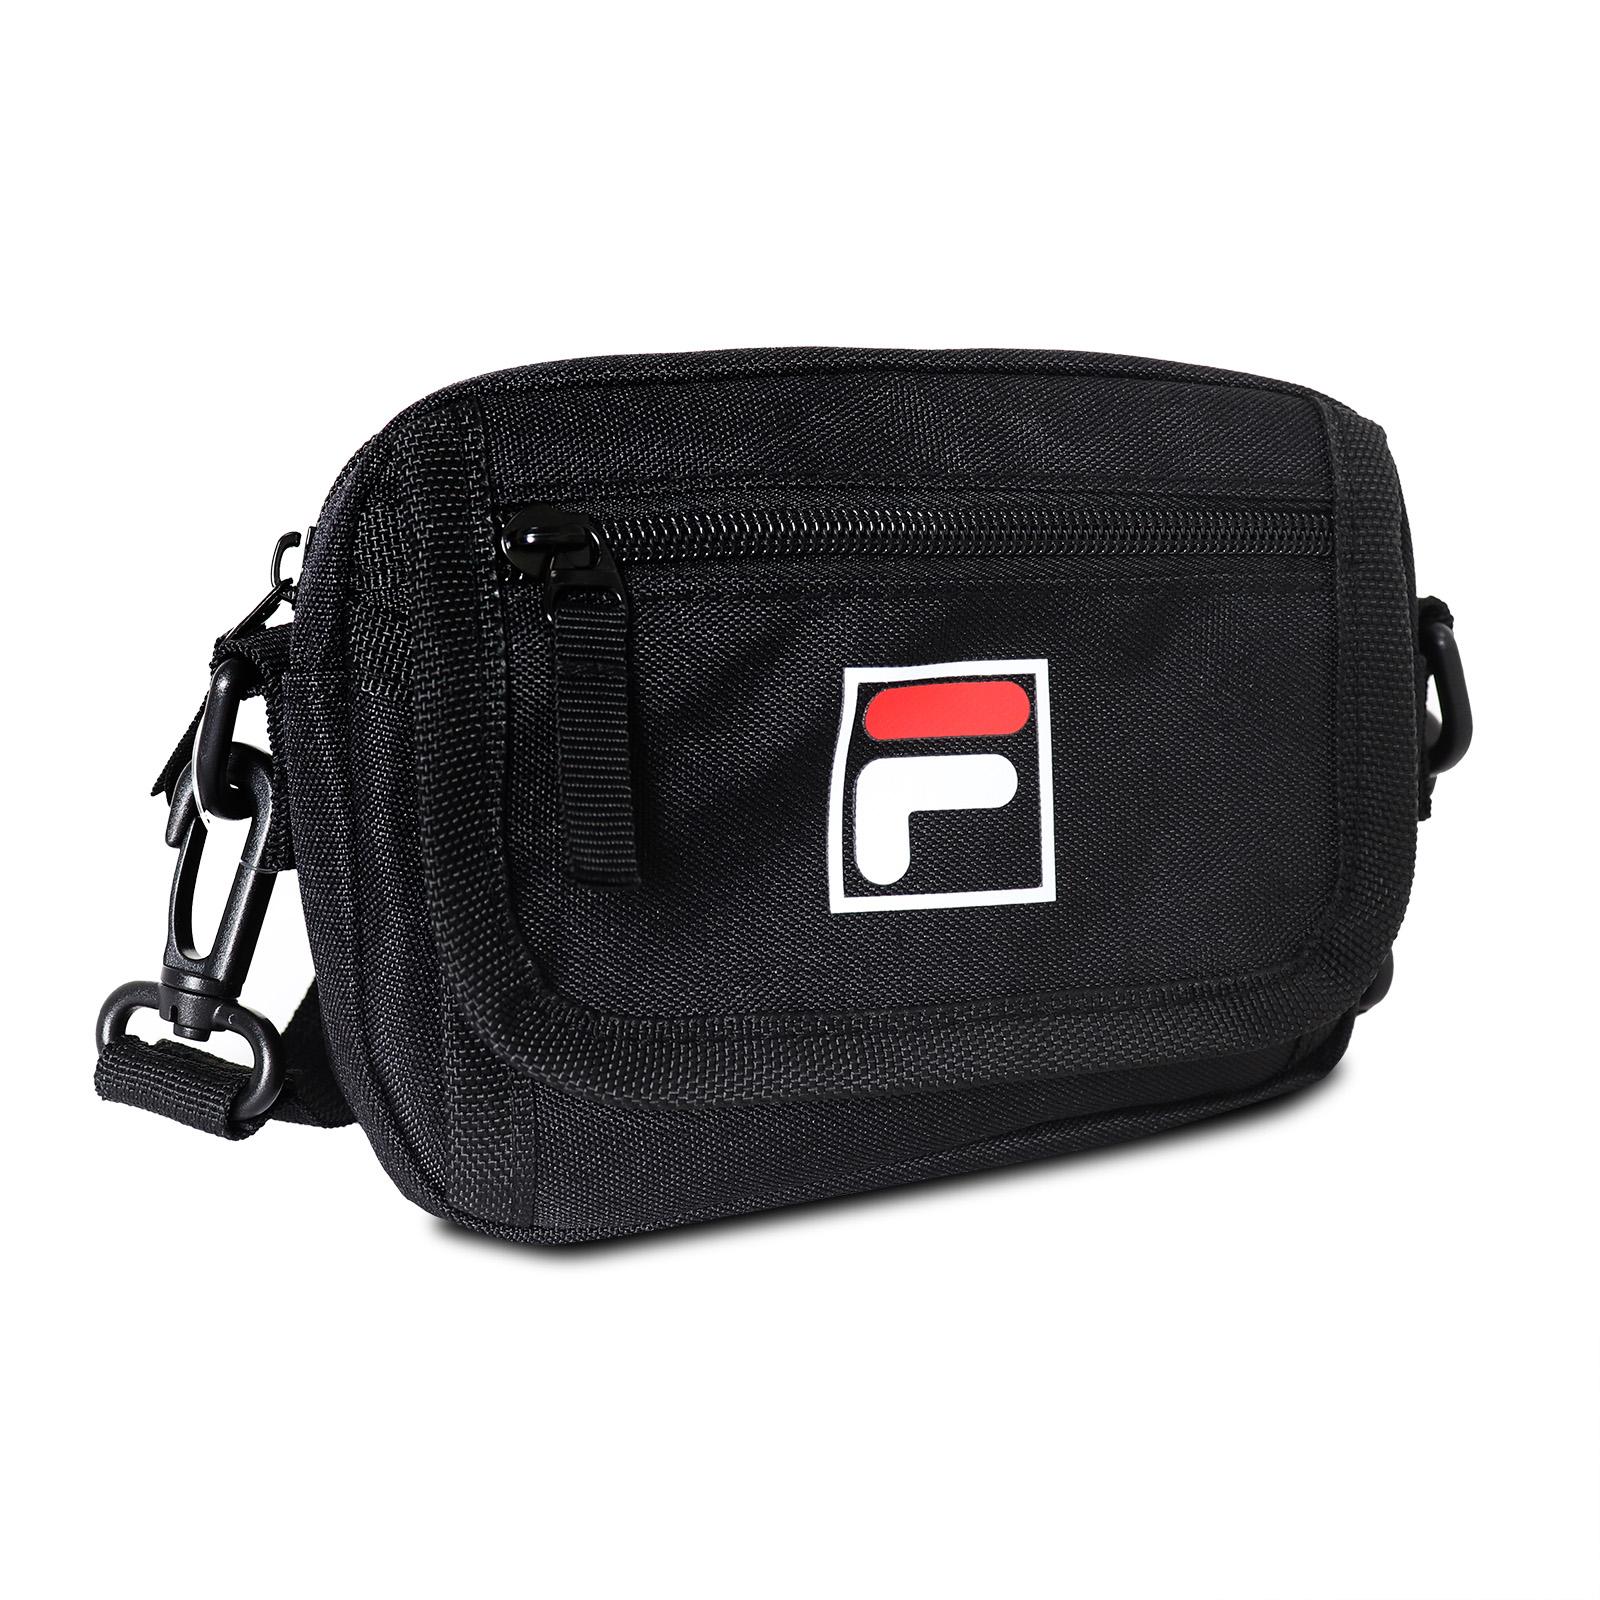 FILA 斜背包 Crossbody Shoulder Bag 黑 白 男女款 外出 側背【ACS】 BMV3018BK